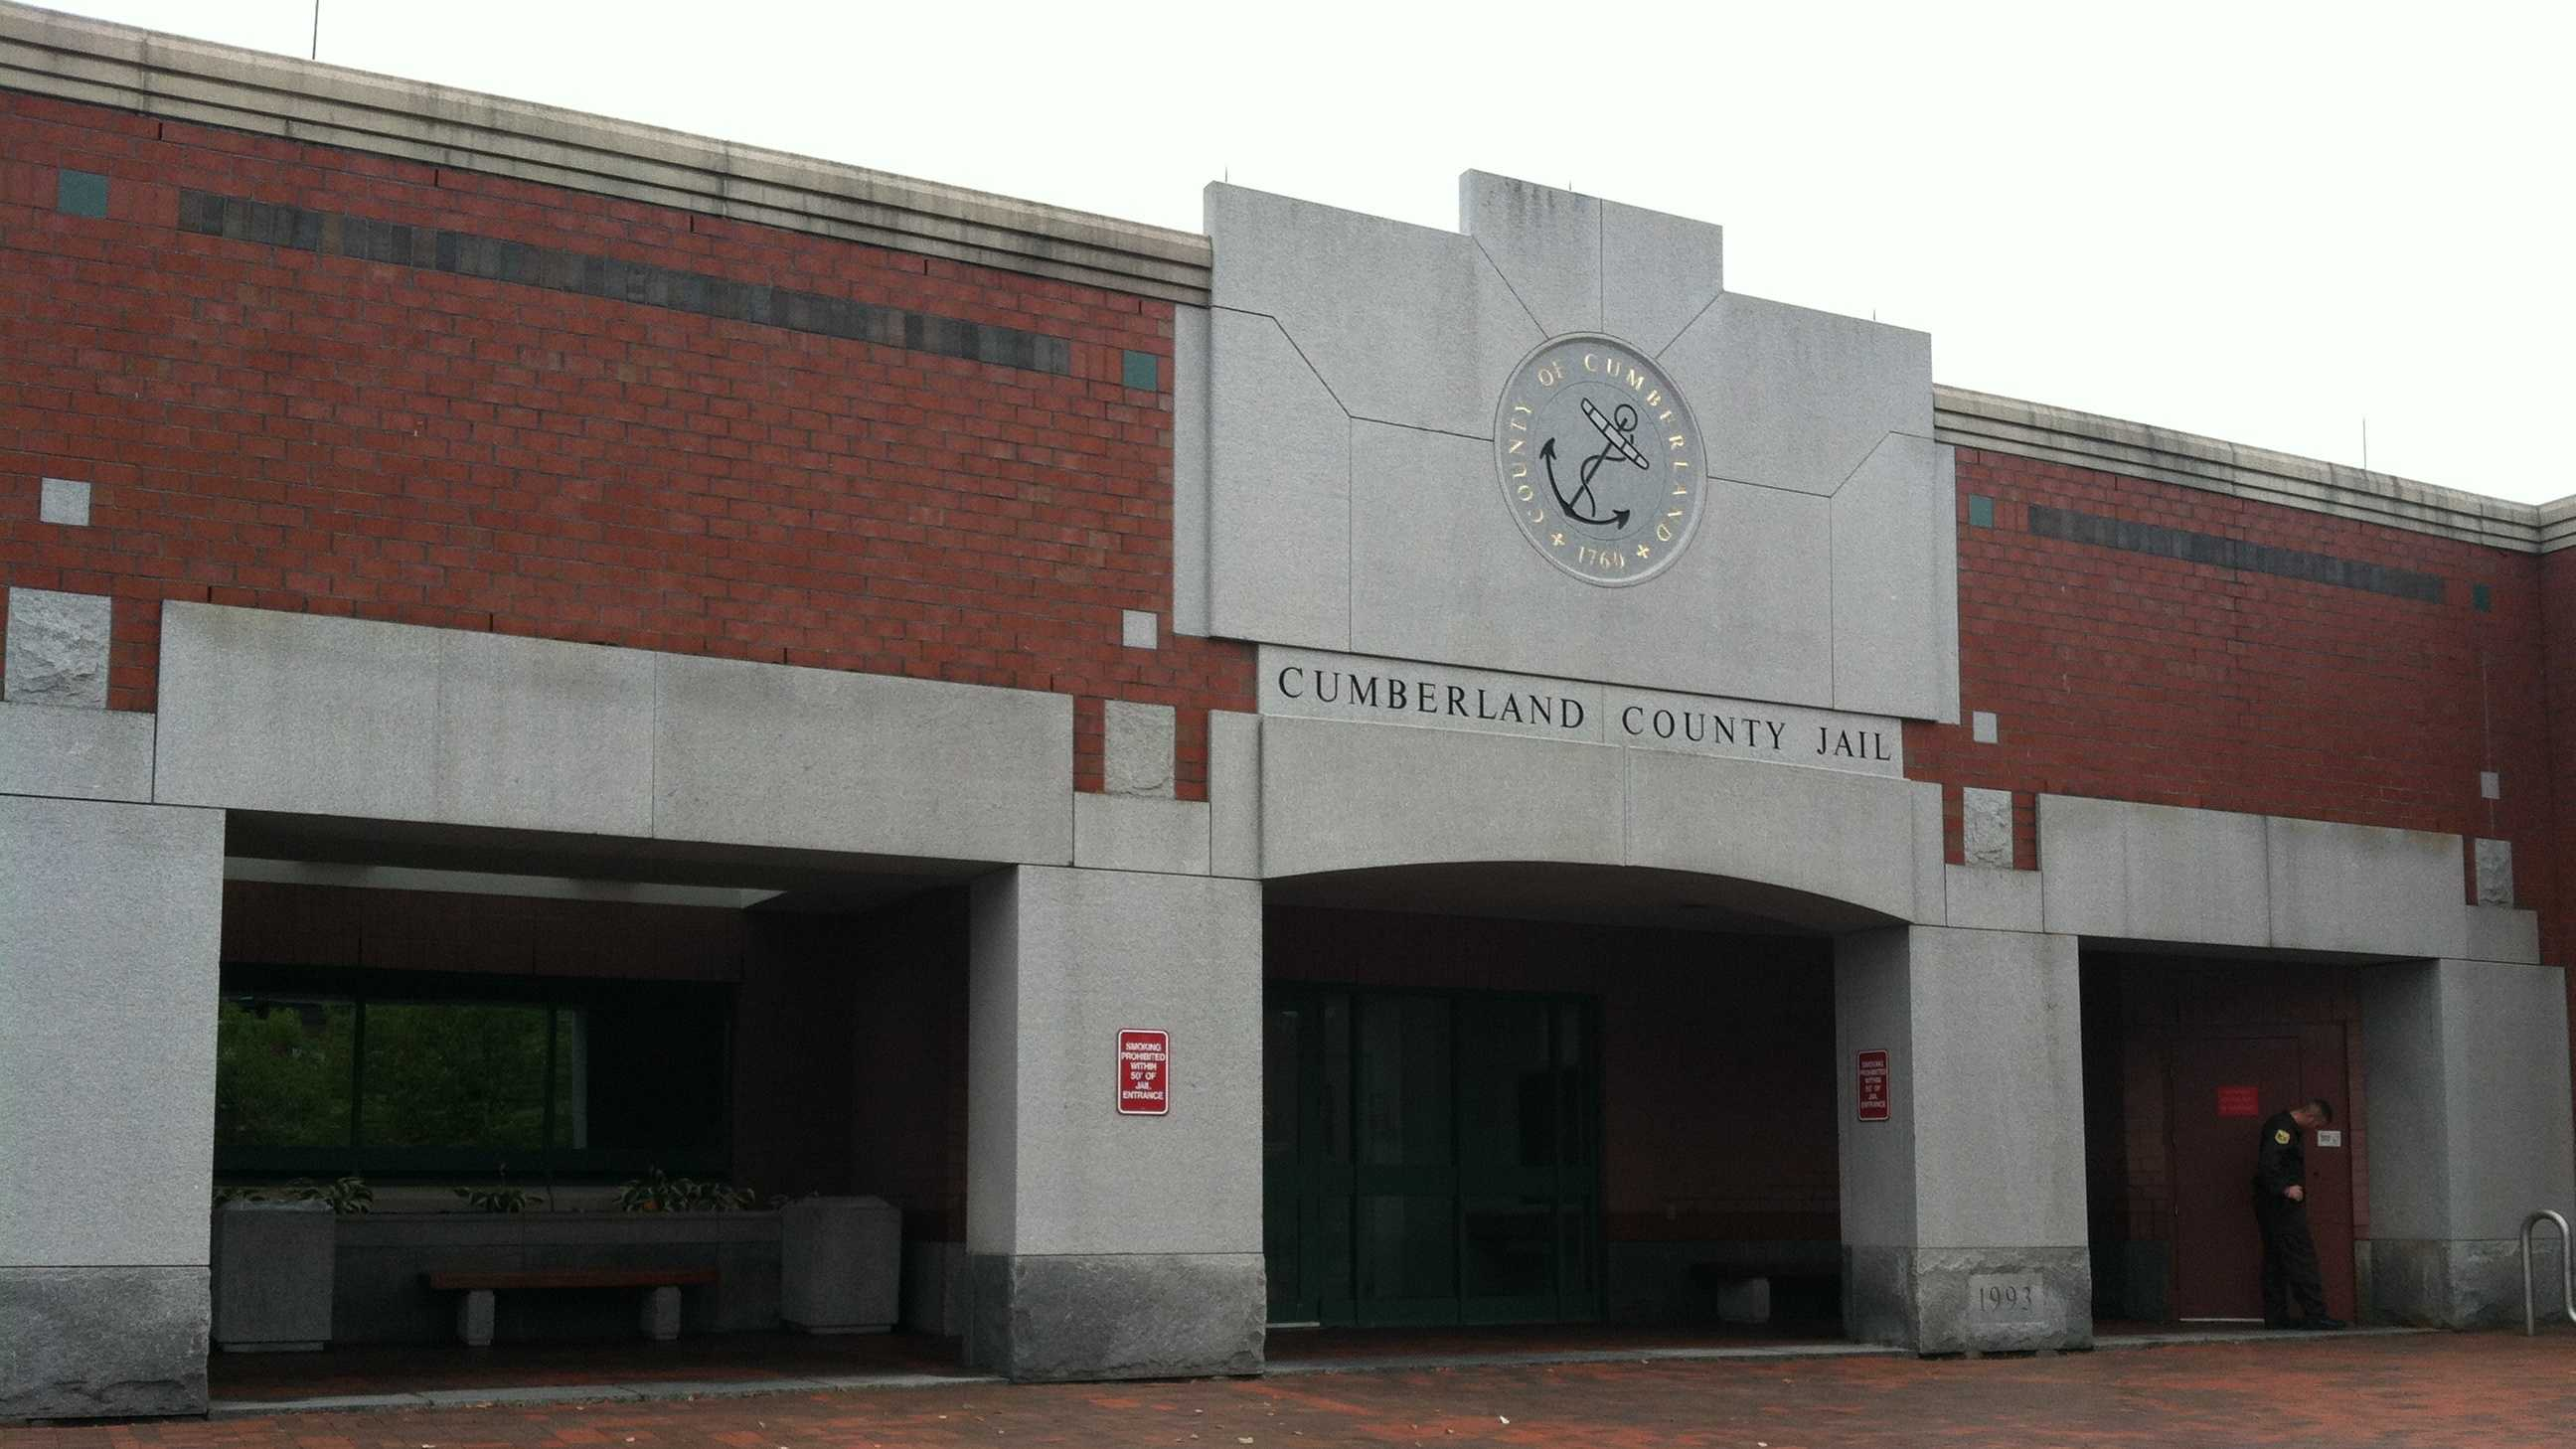 Cumberland County Jail